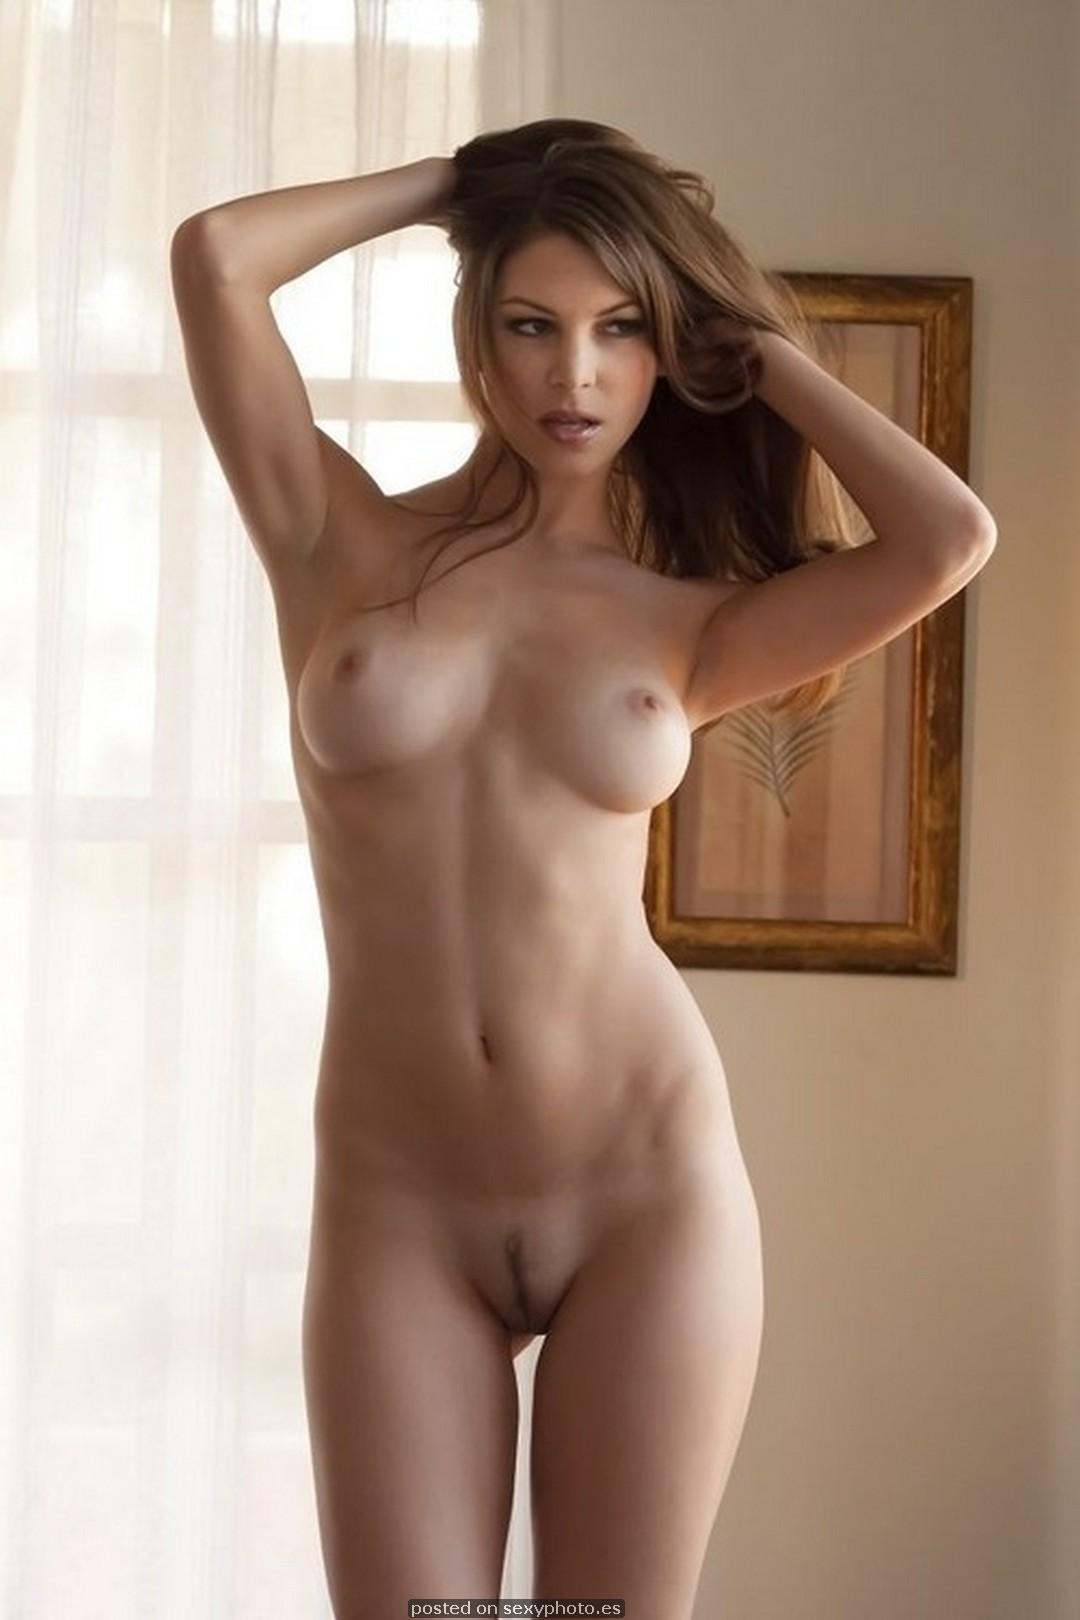 chicas guapas, jovenes sexis, hot girls, sexy photo, fotos sexis, ass amateur, amateur boobs, perfect ass